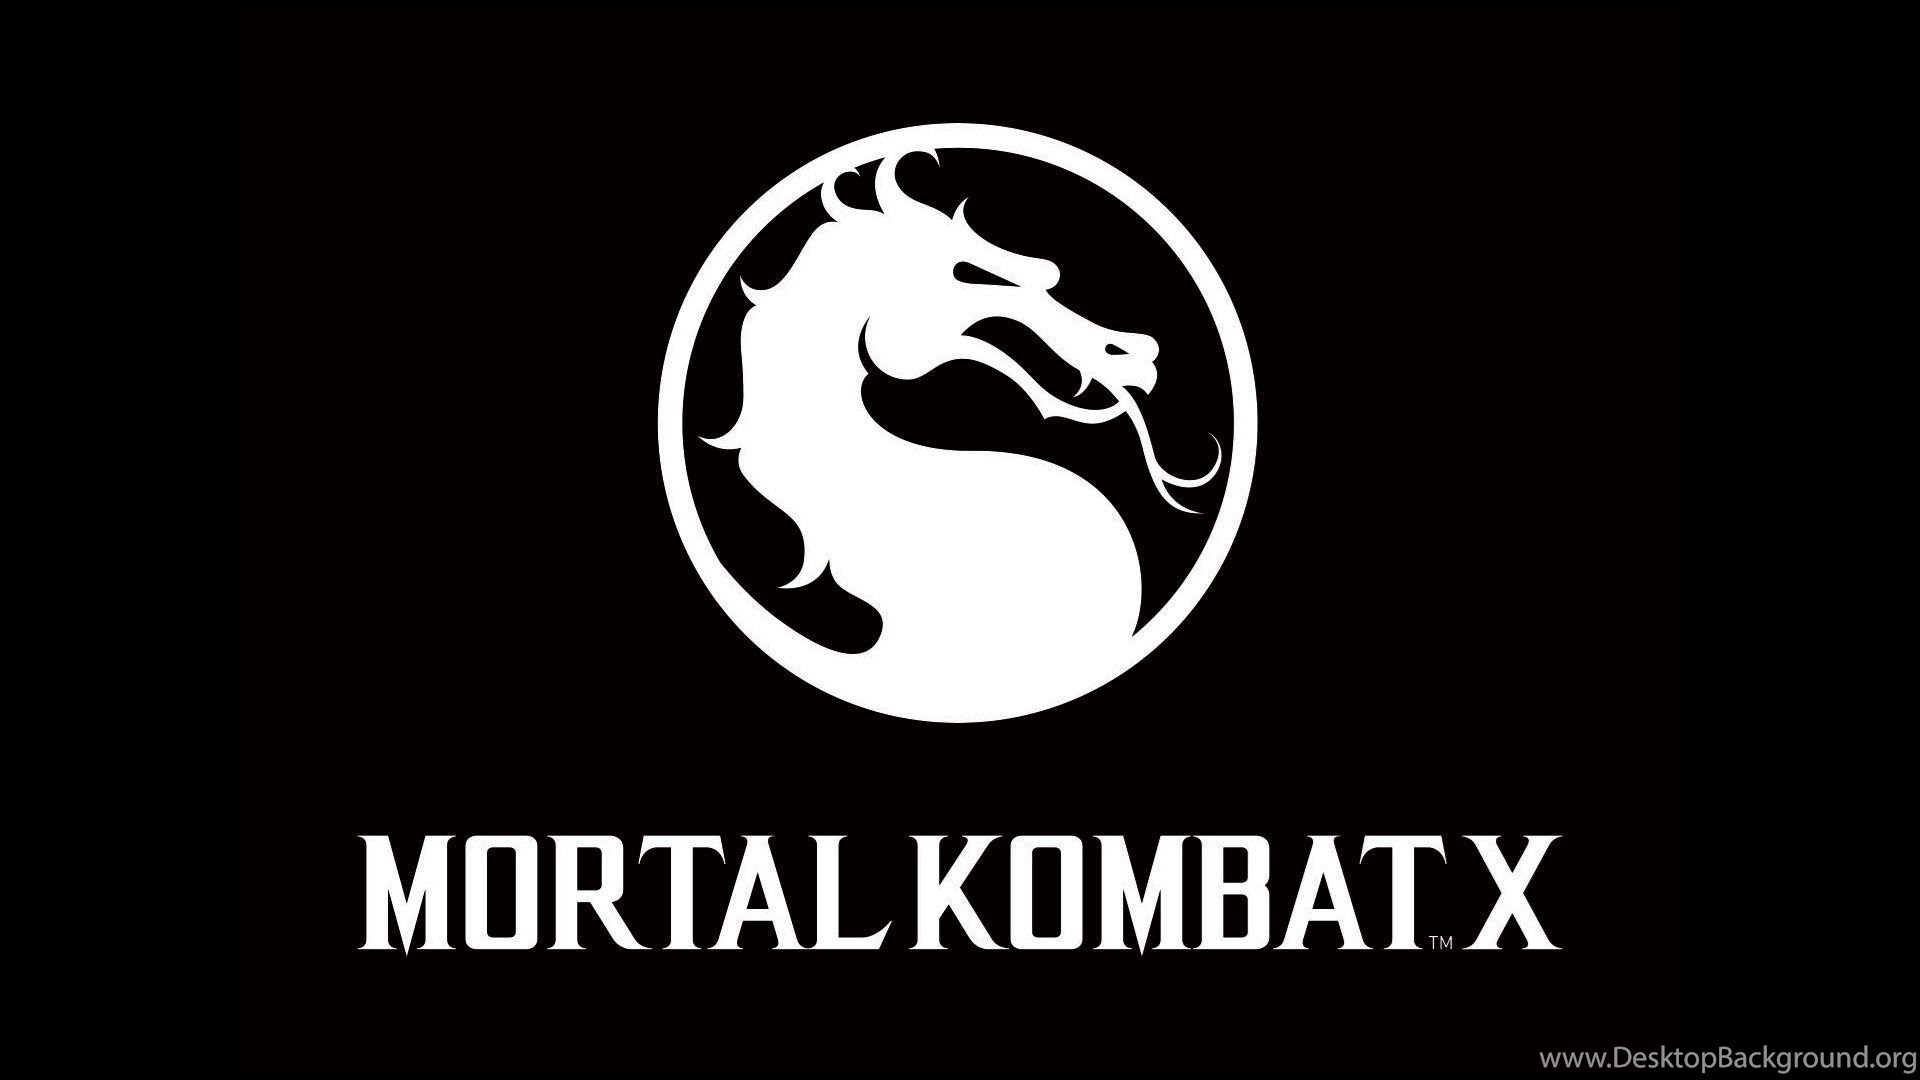 Mortal Kombat X Logo 1920x1080 Full Hd 16 9 Wallpapers Desktop